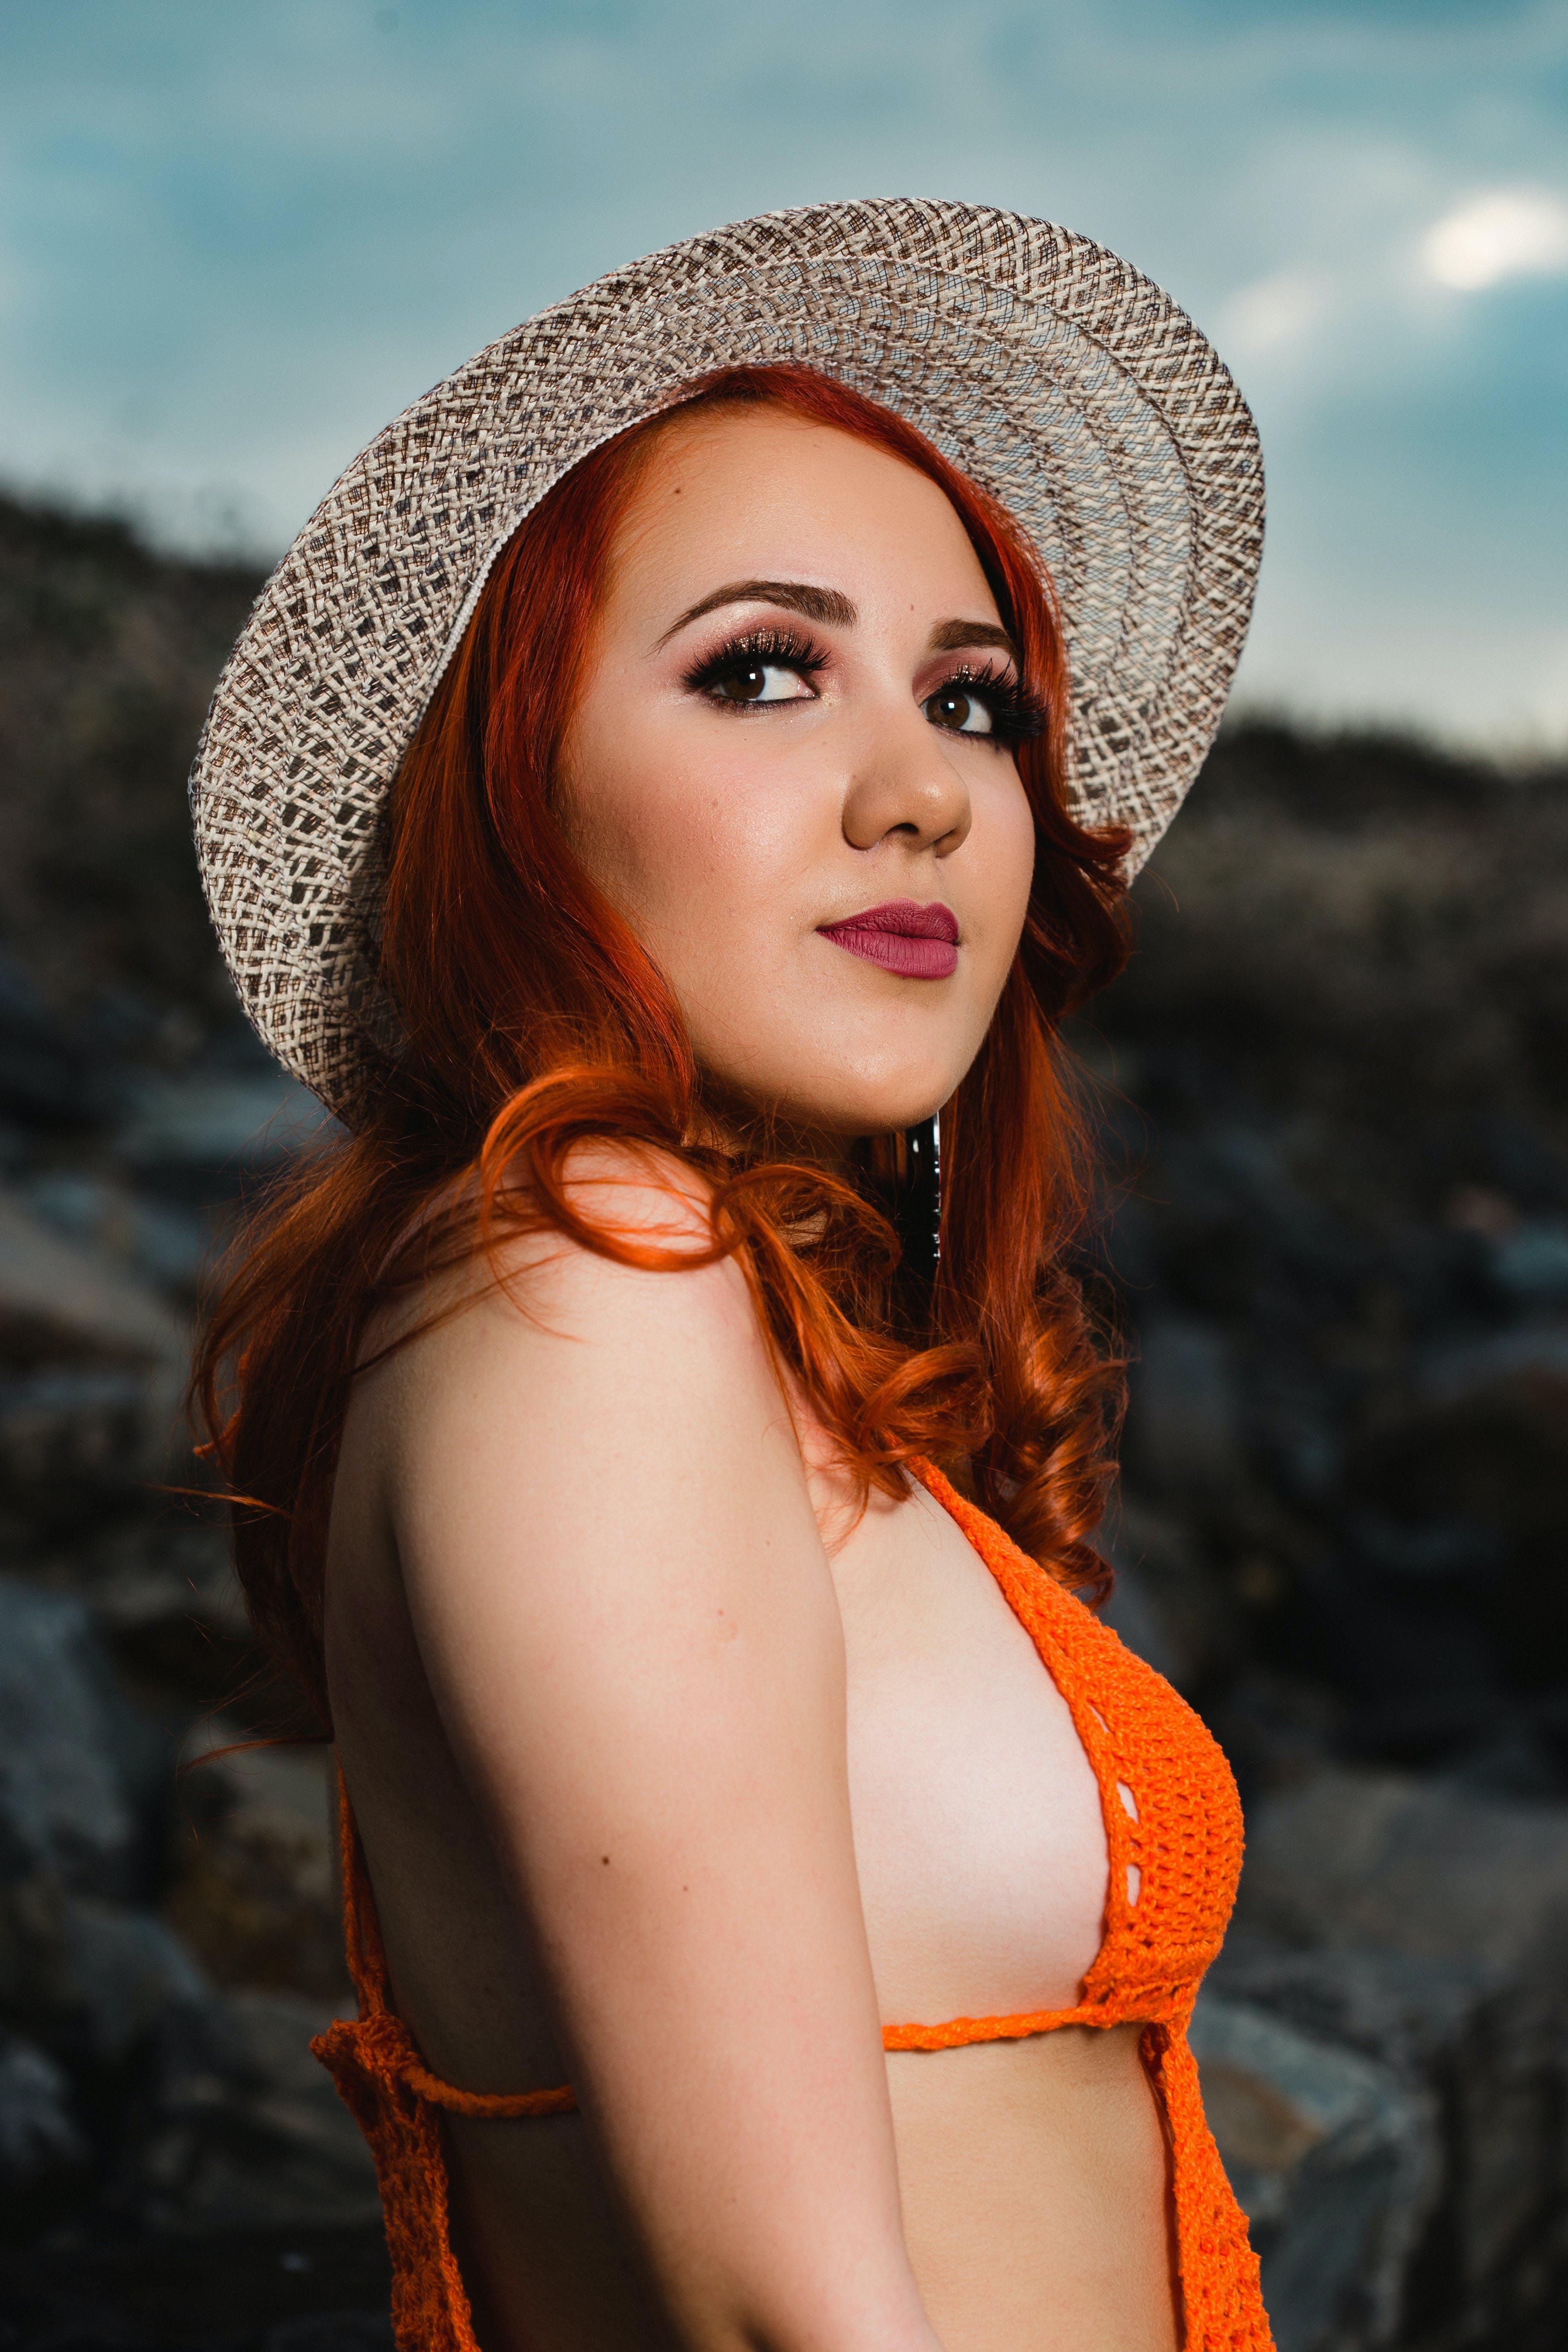 Woman in Orange Top